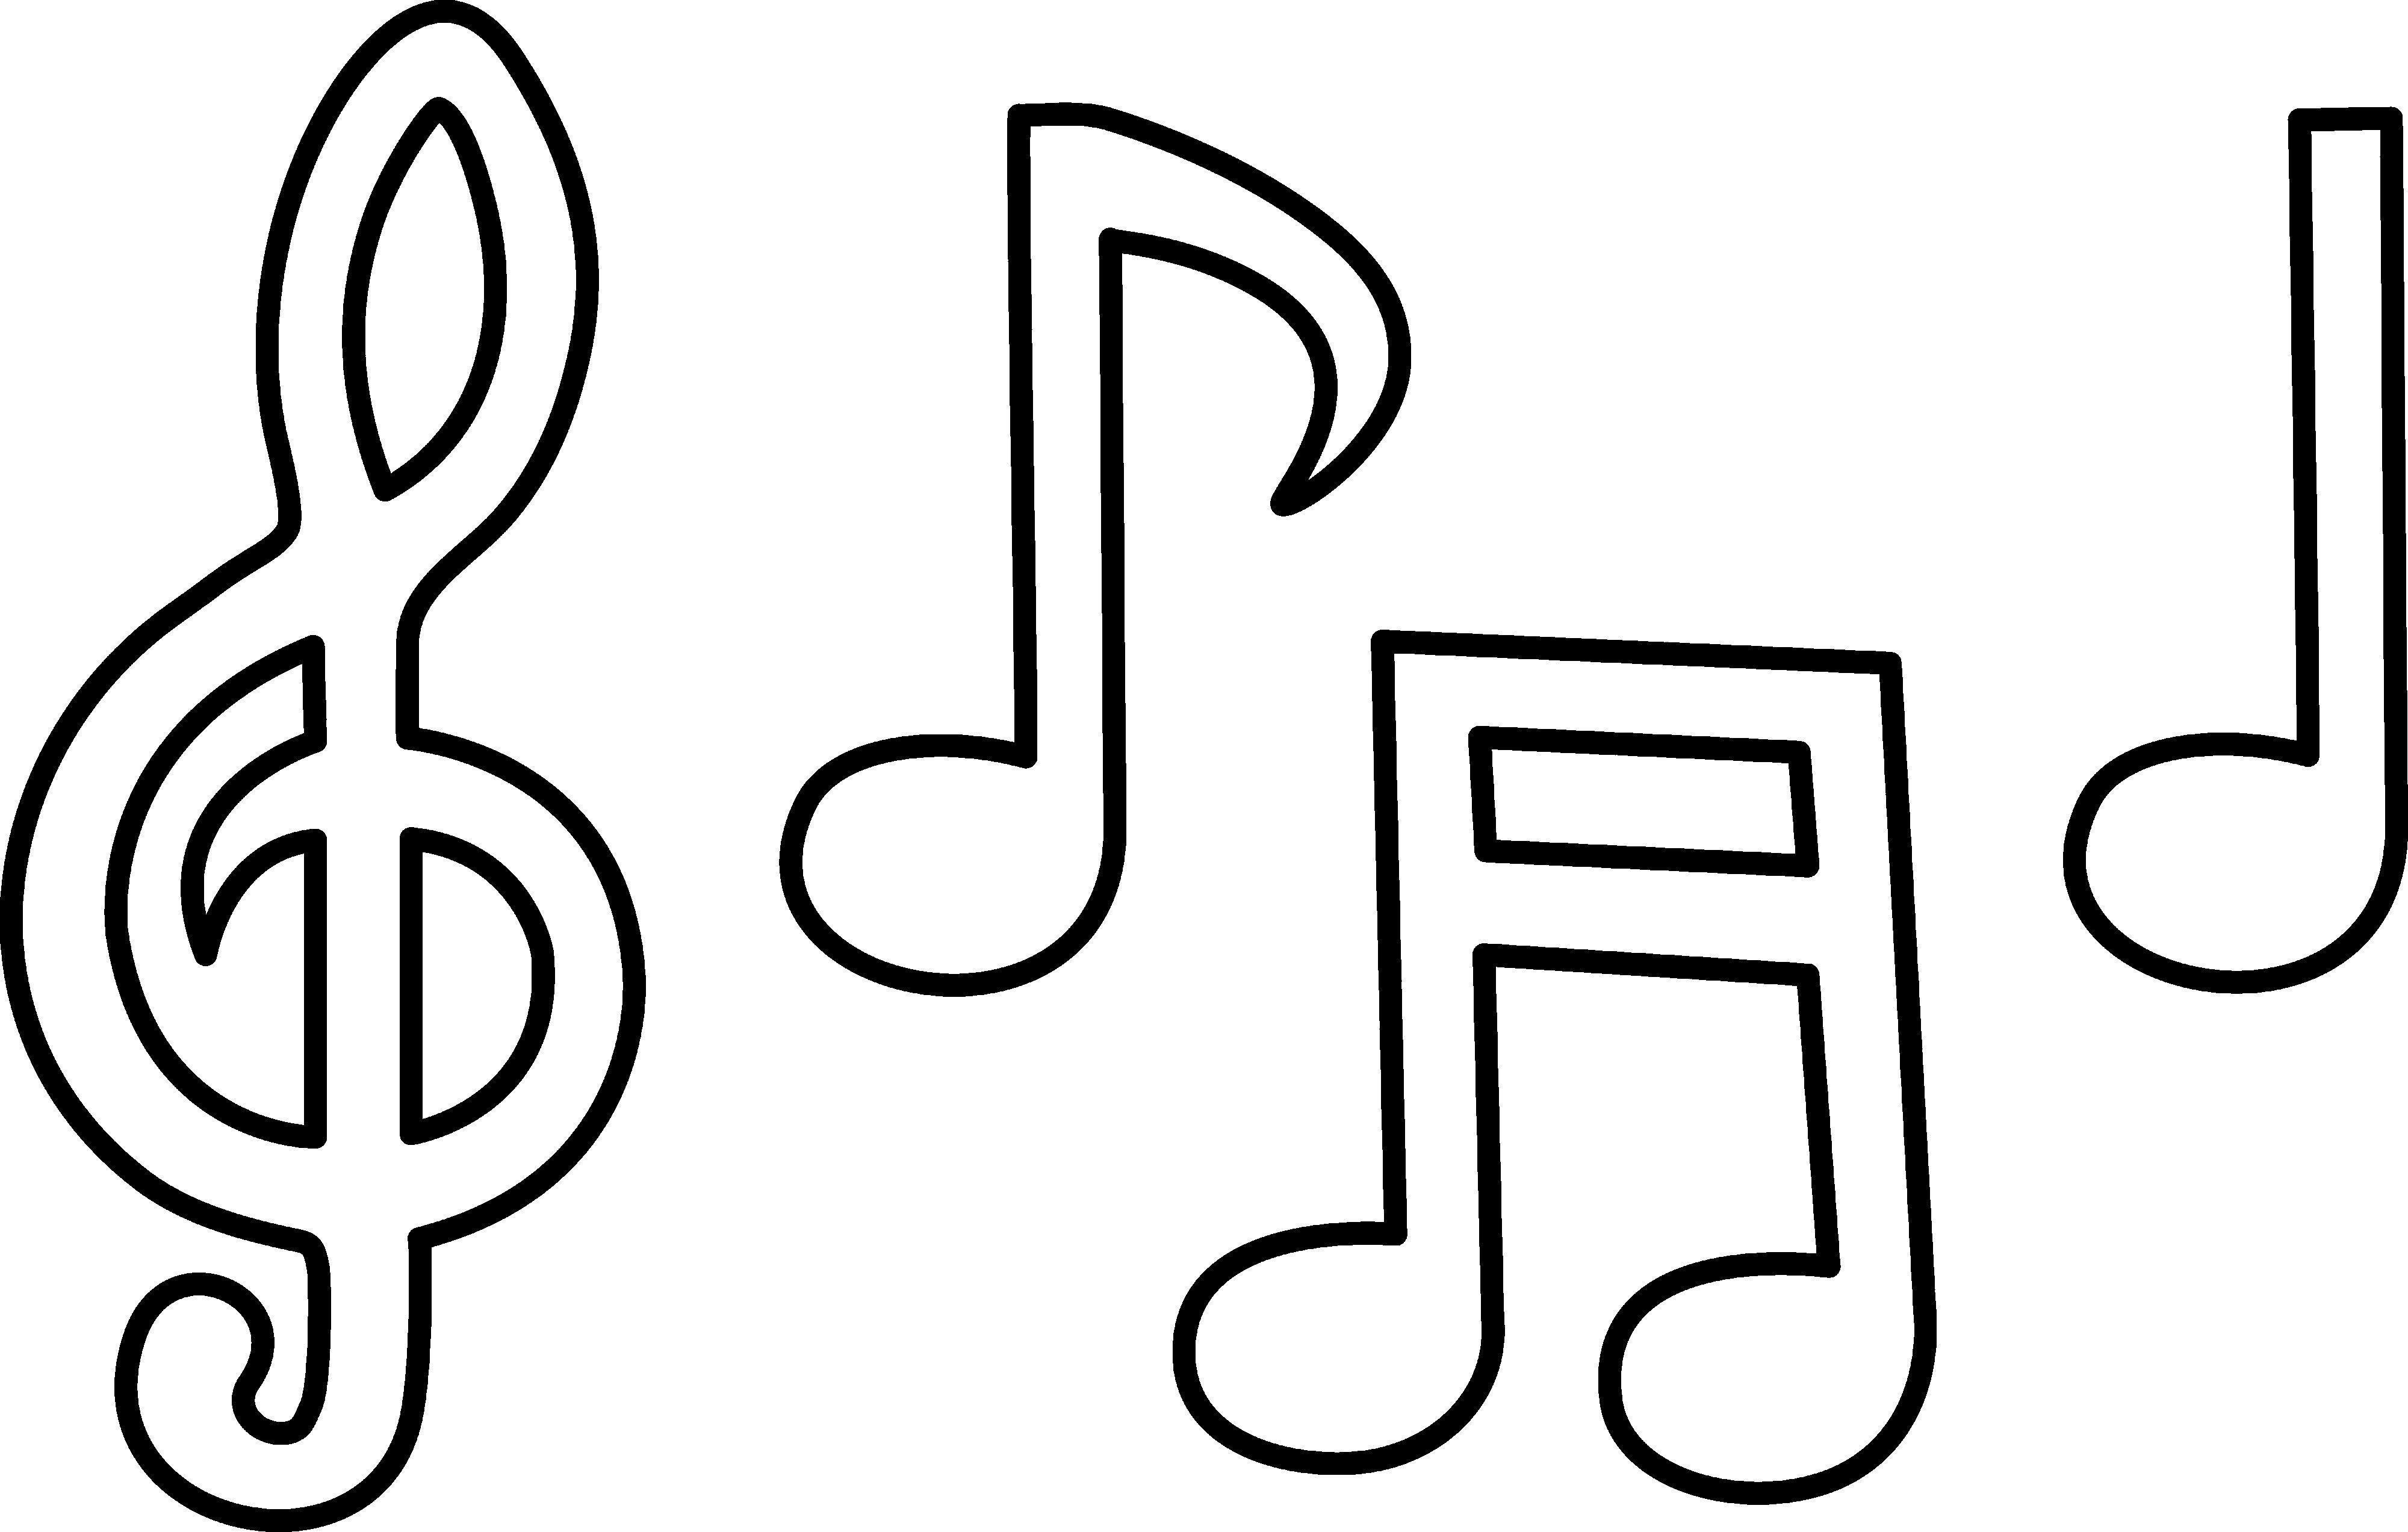 Pin On Notas Musicales Dibujos